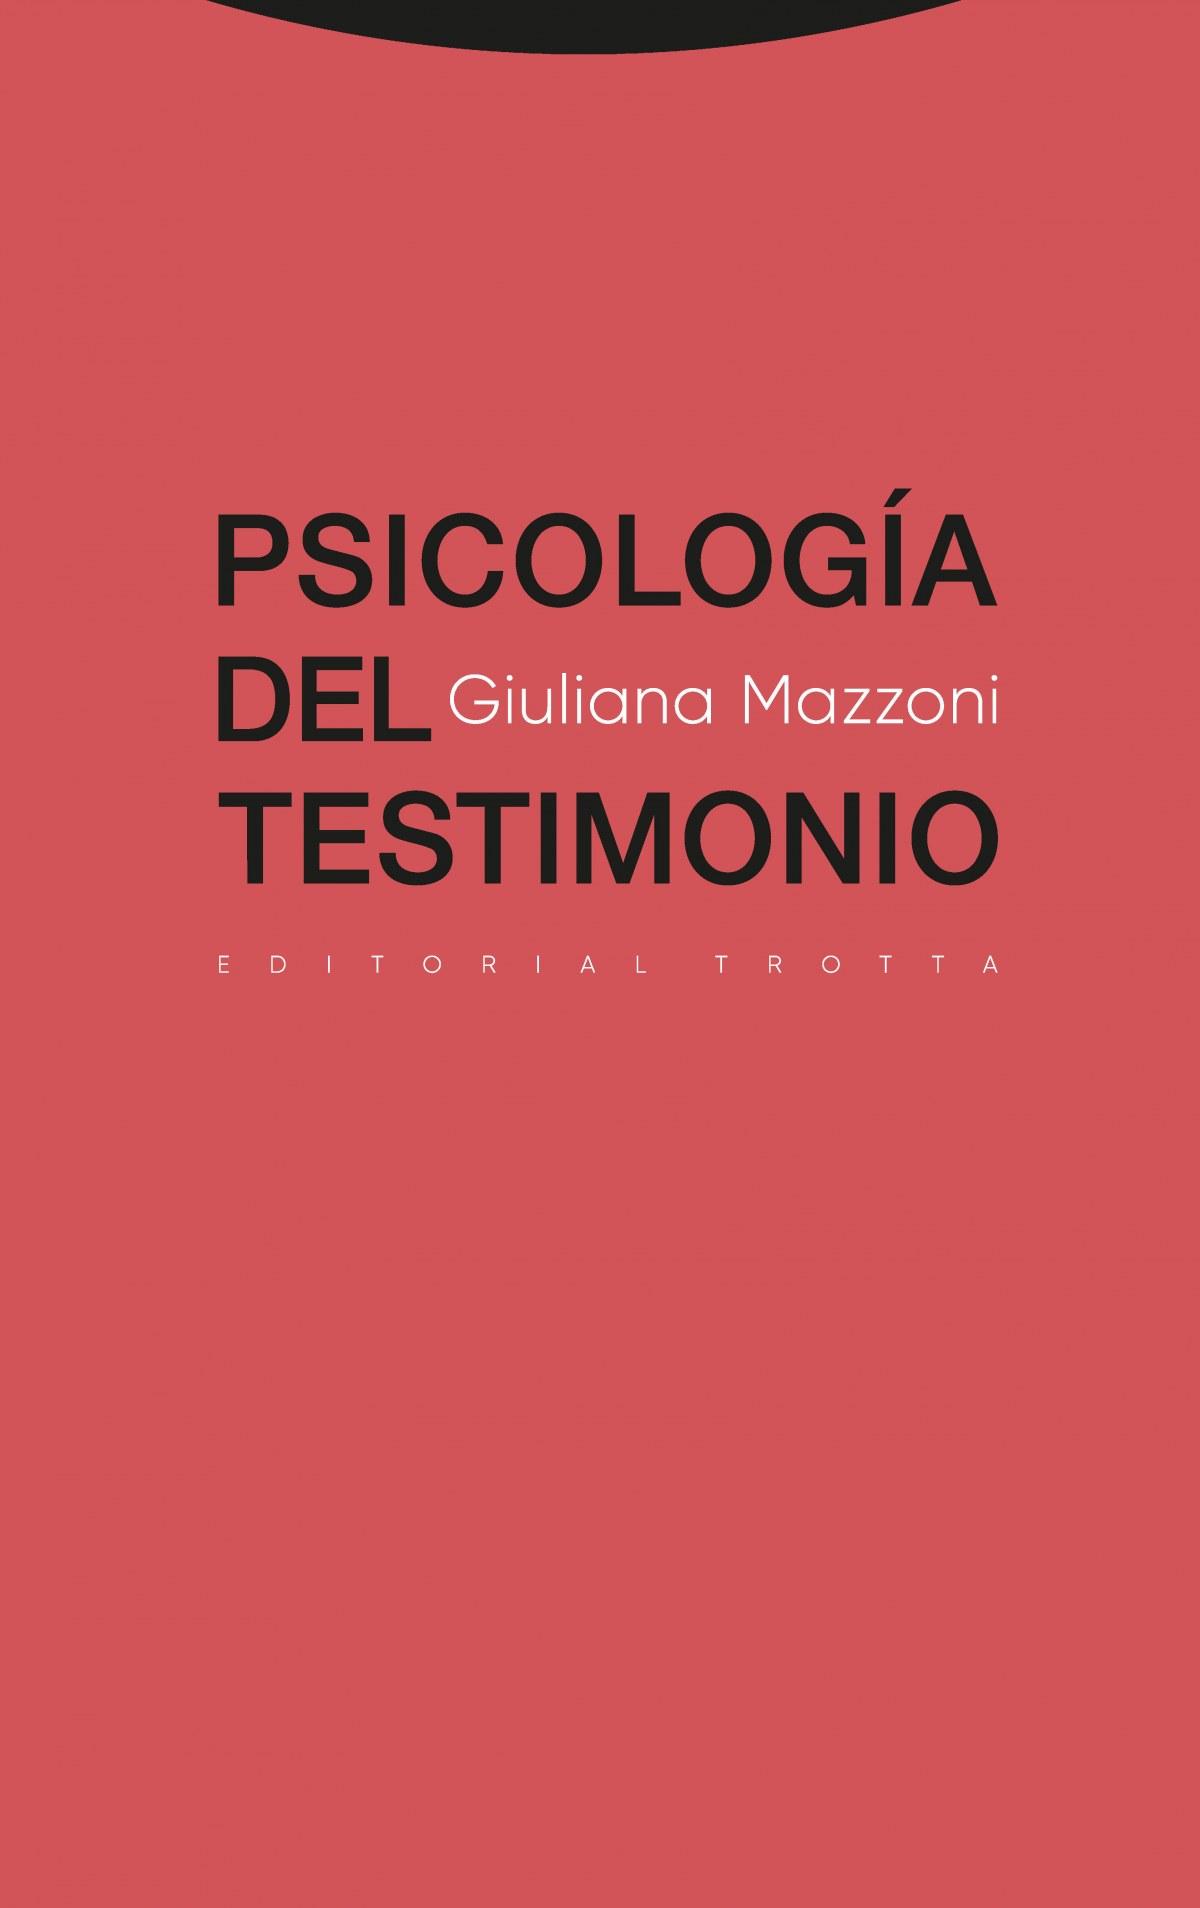 PSICOLOGÍA DEL TESTIMONIO 9788498797541